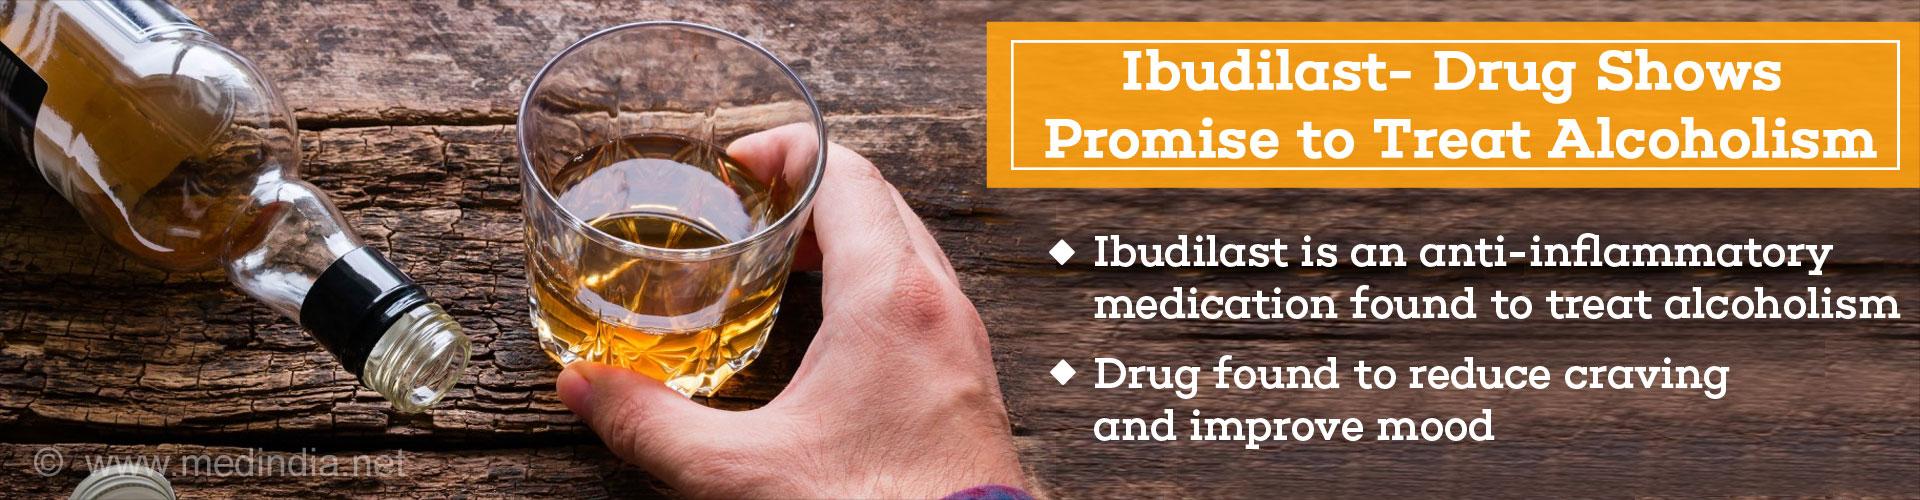 Ibudilast- Anti-inflammatory Medication Shows New Hope in Treating Alcoholism